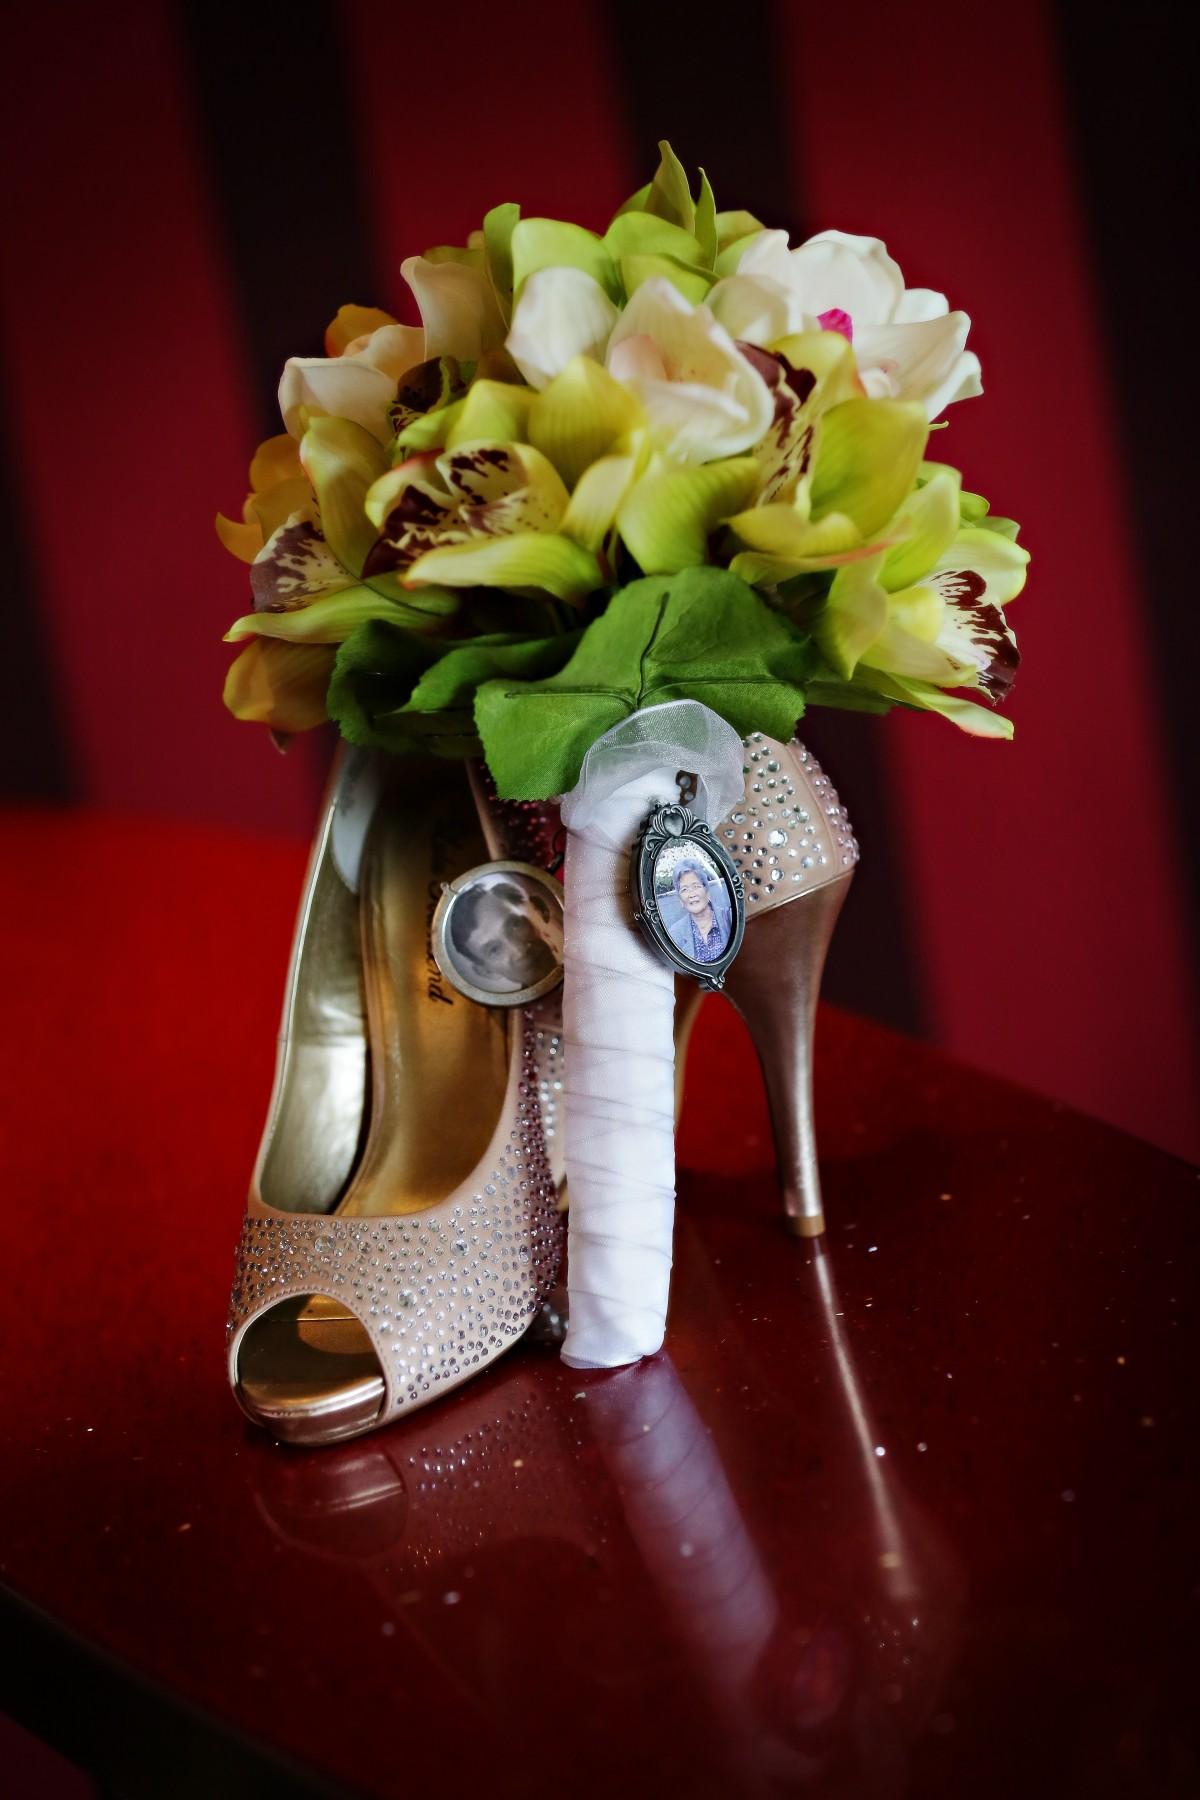 Gambar menanam musim semi kuning berwarna merah muda #9: wedding bouquet shoes heels broach celebration marriage pink d